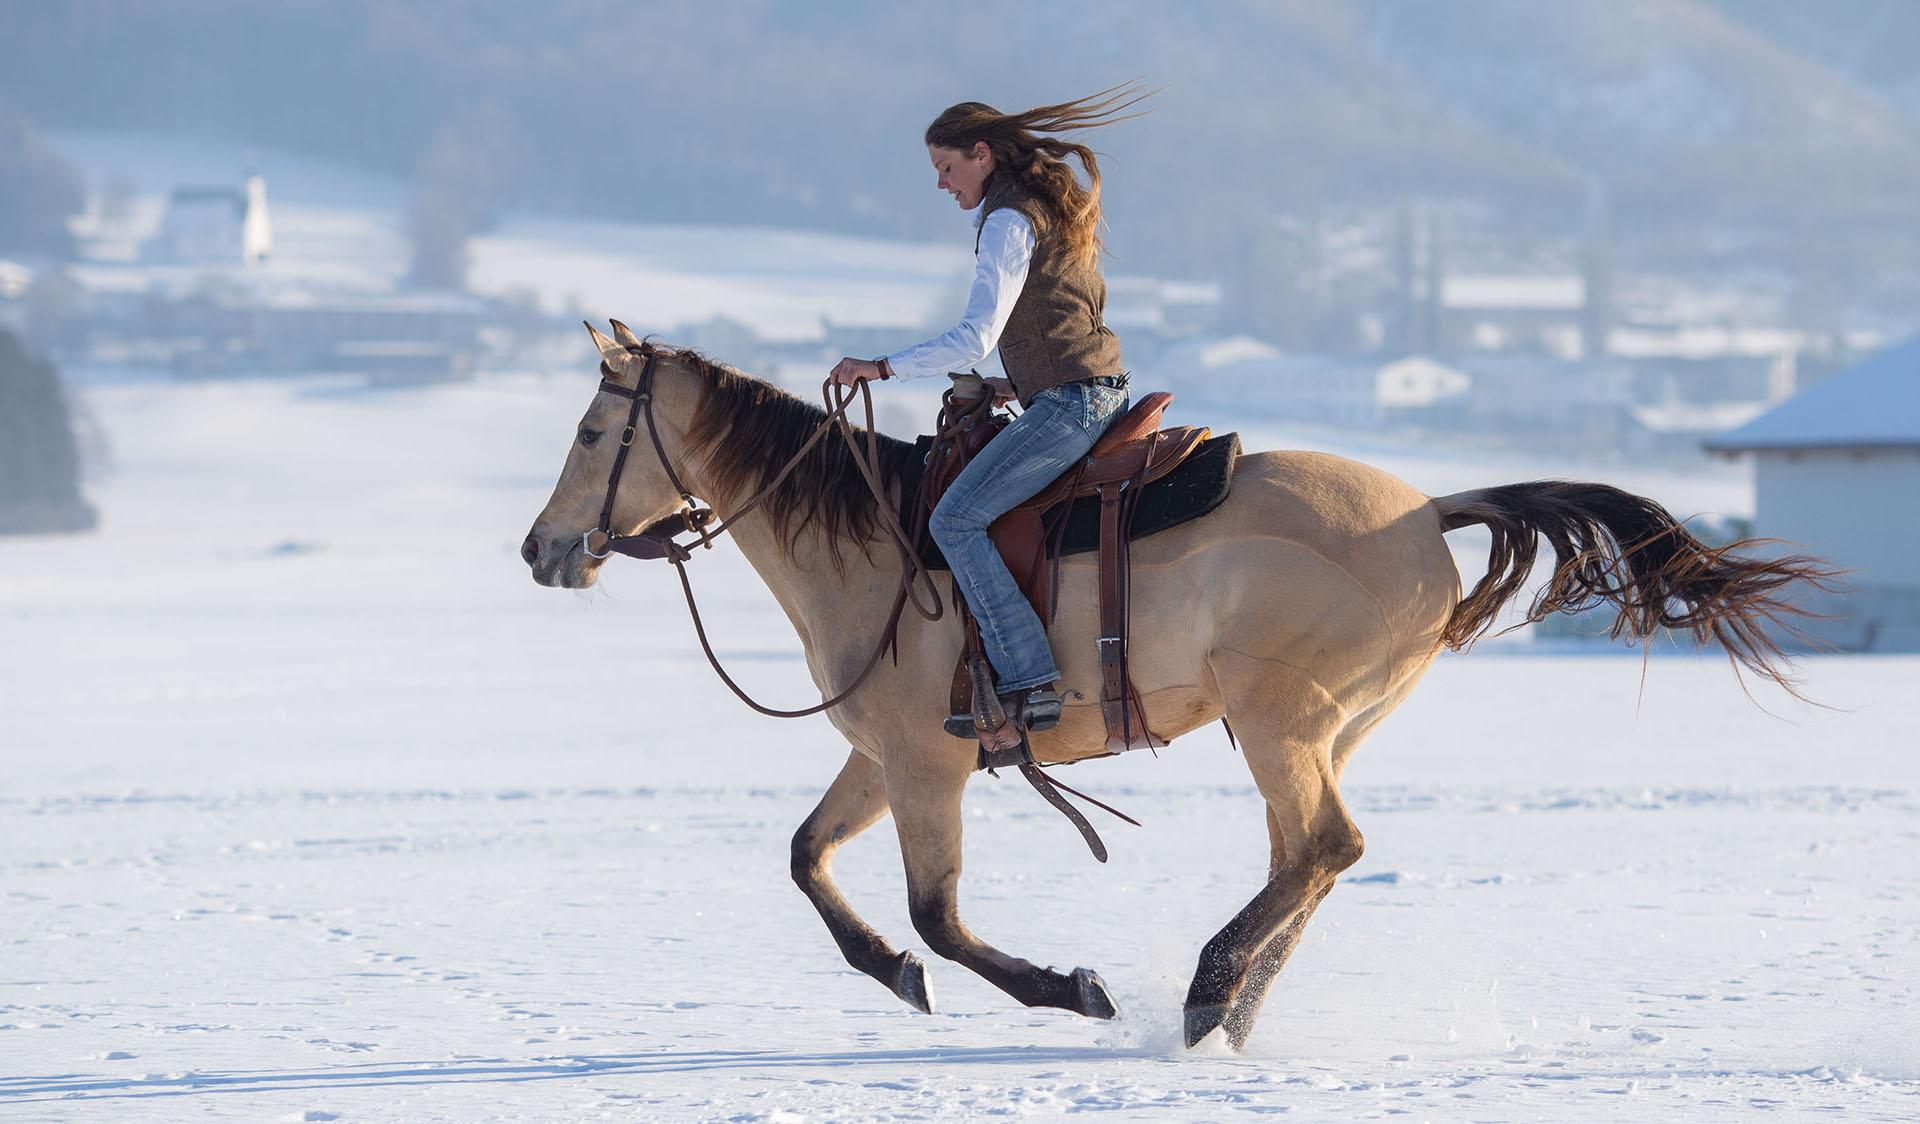 Hund&Pferd_snowEquine